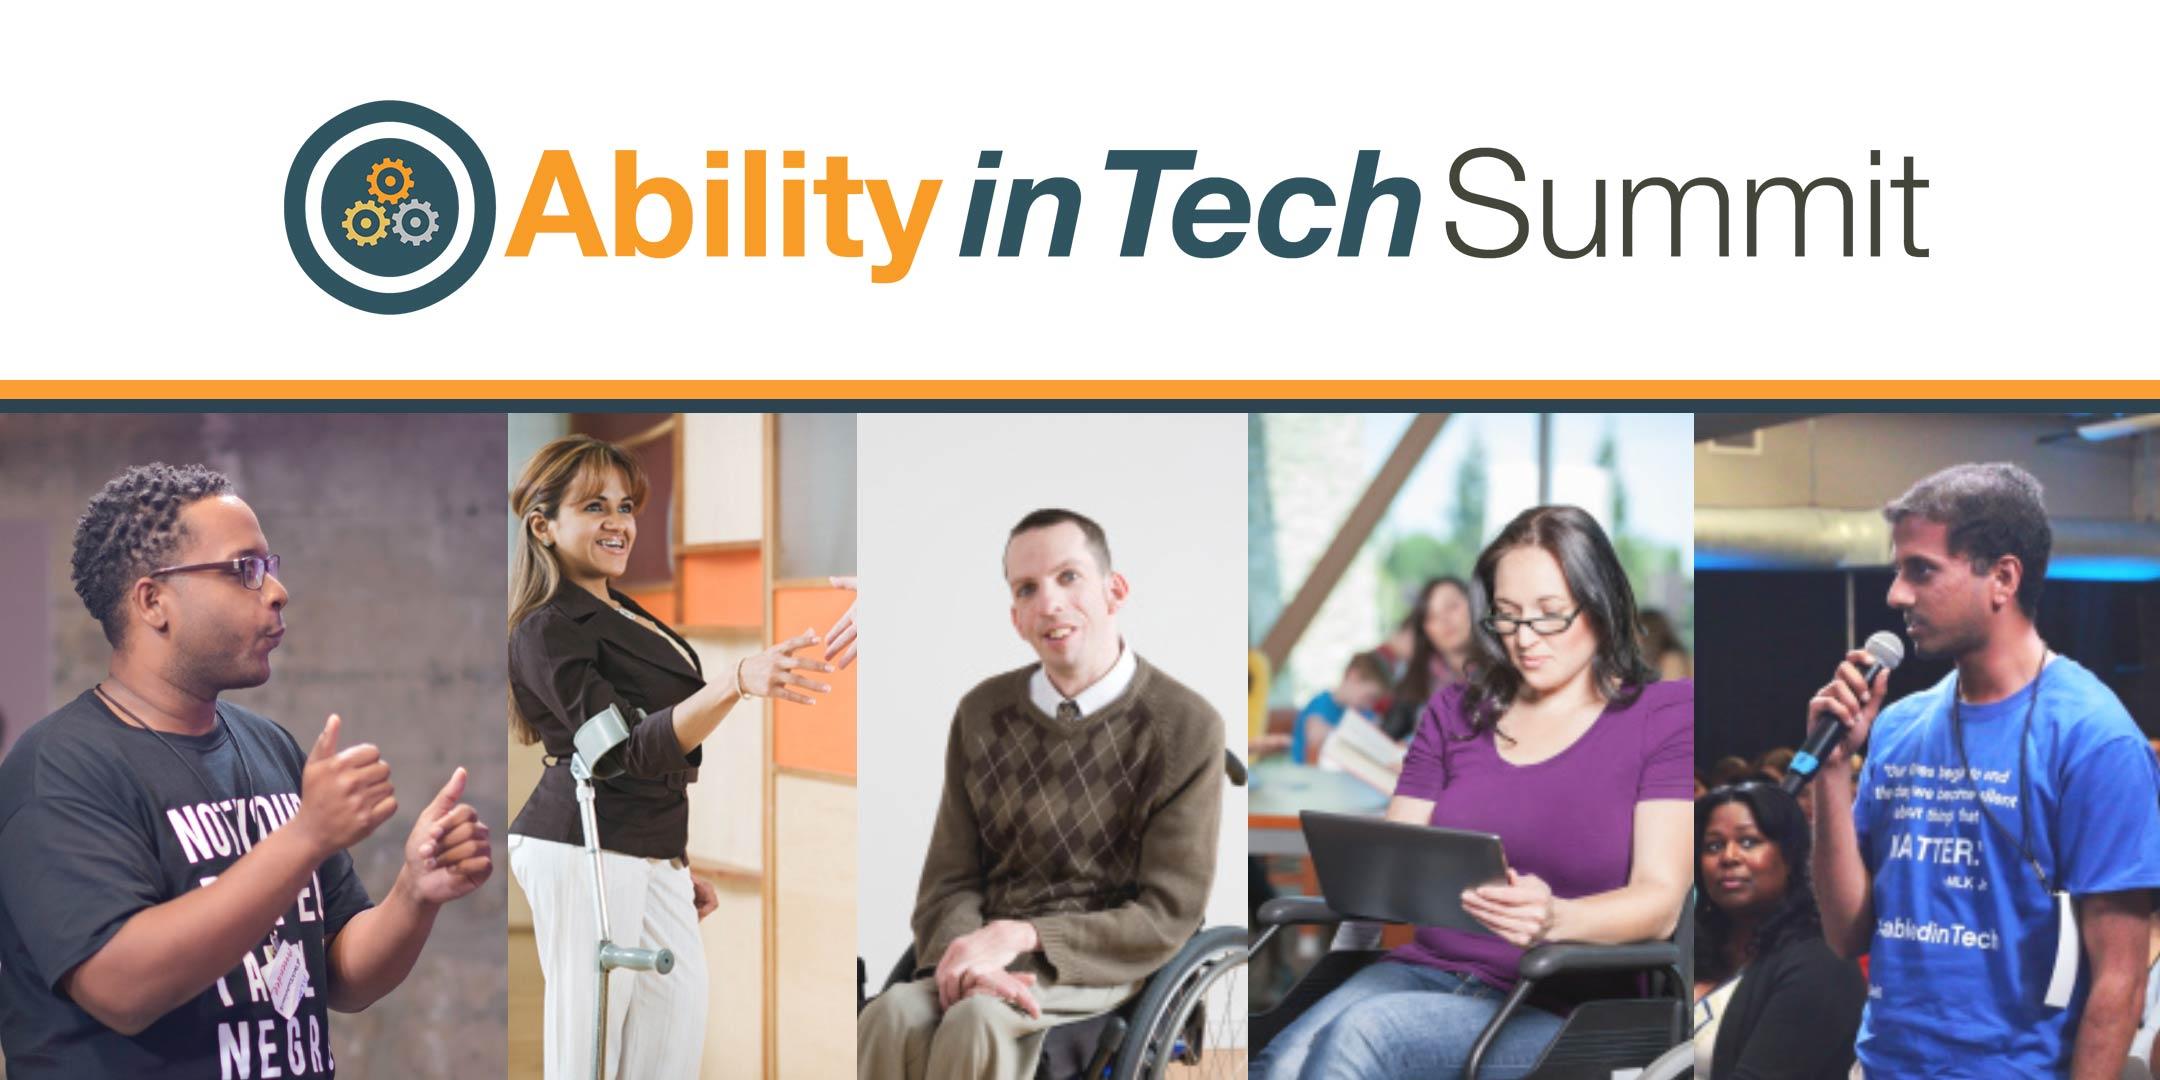 Ability In Tech Summit | Career Fair & Technology Showcase, May 21st